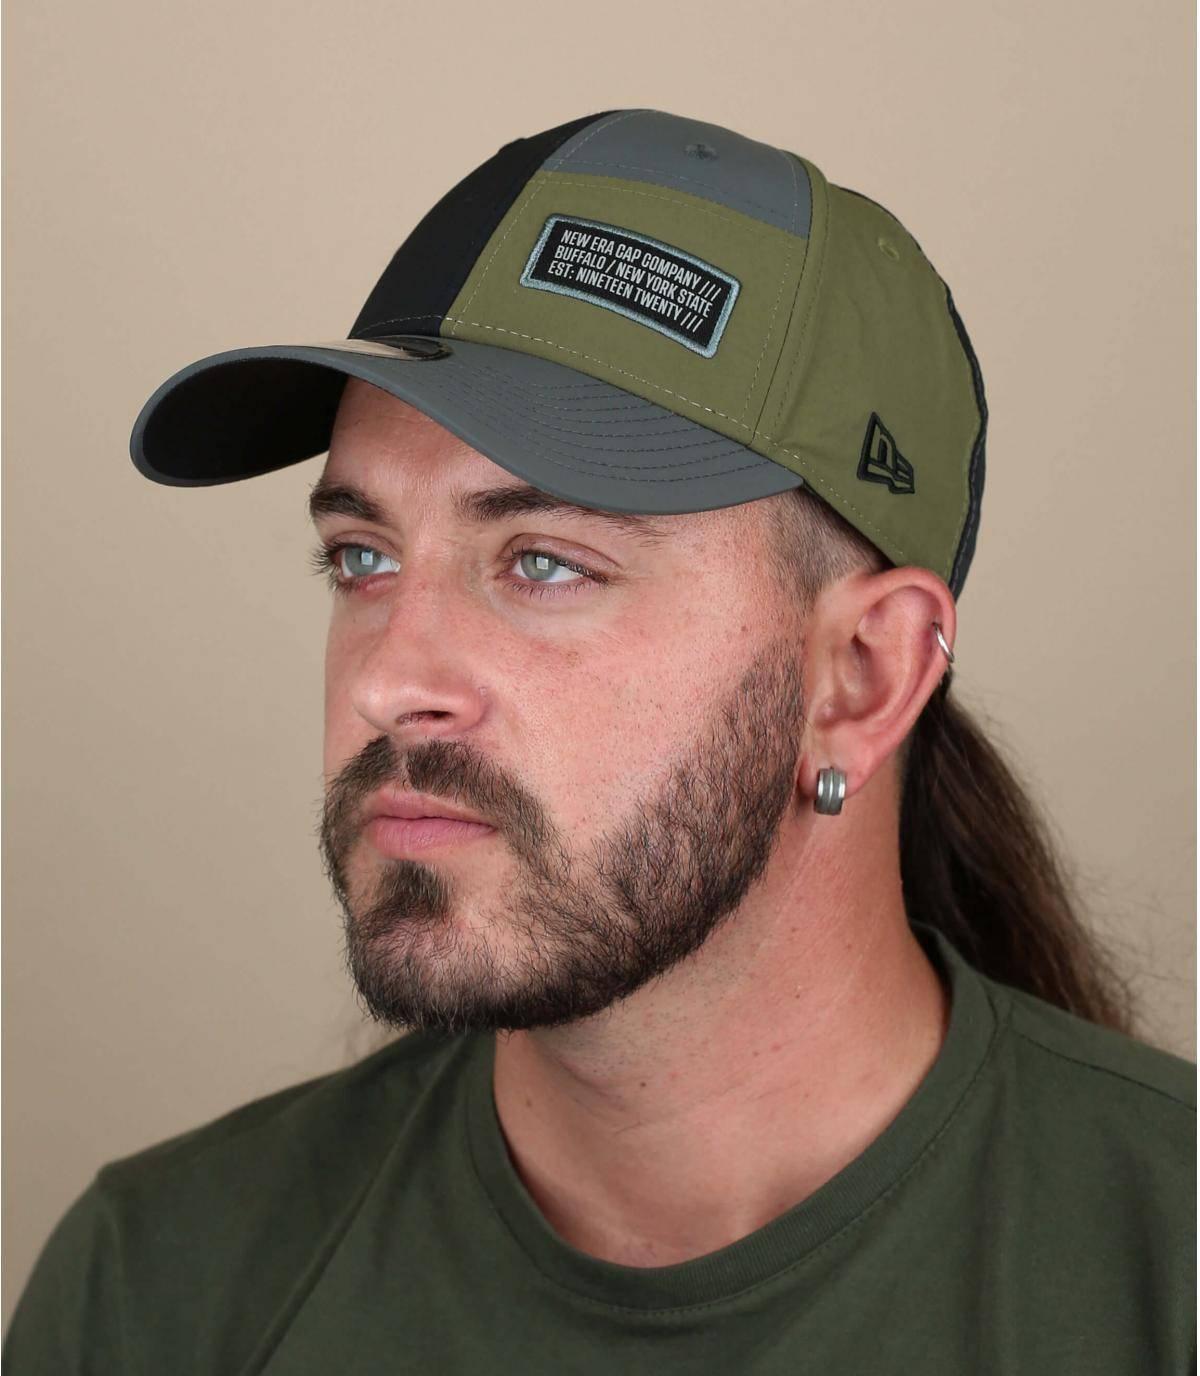 cappellino New Era bicolore